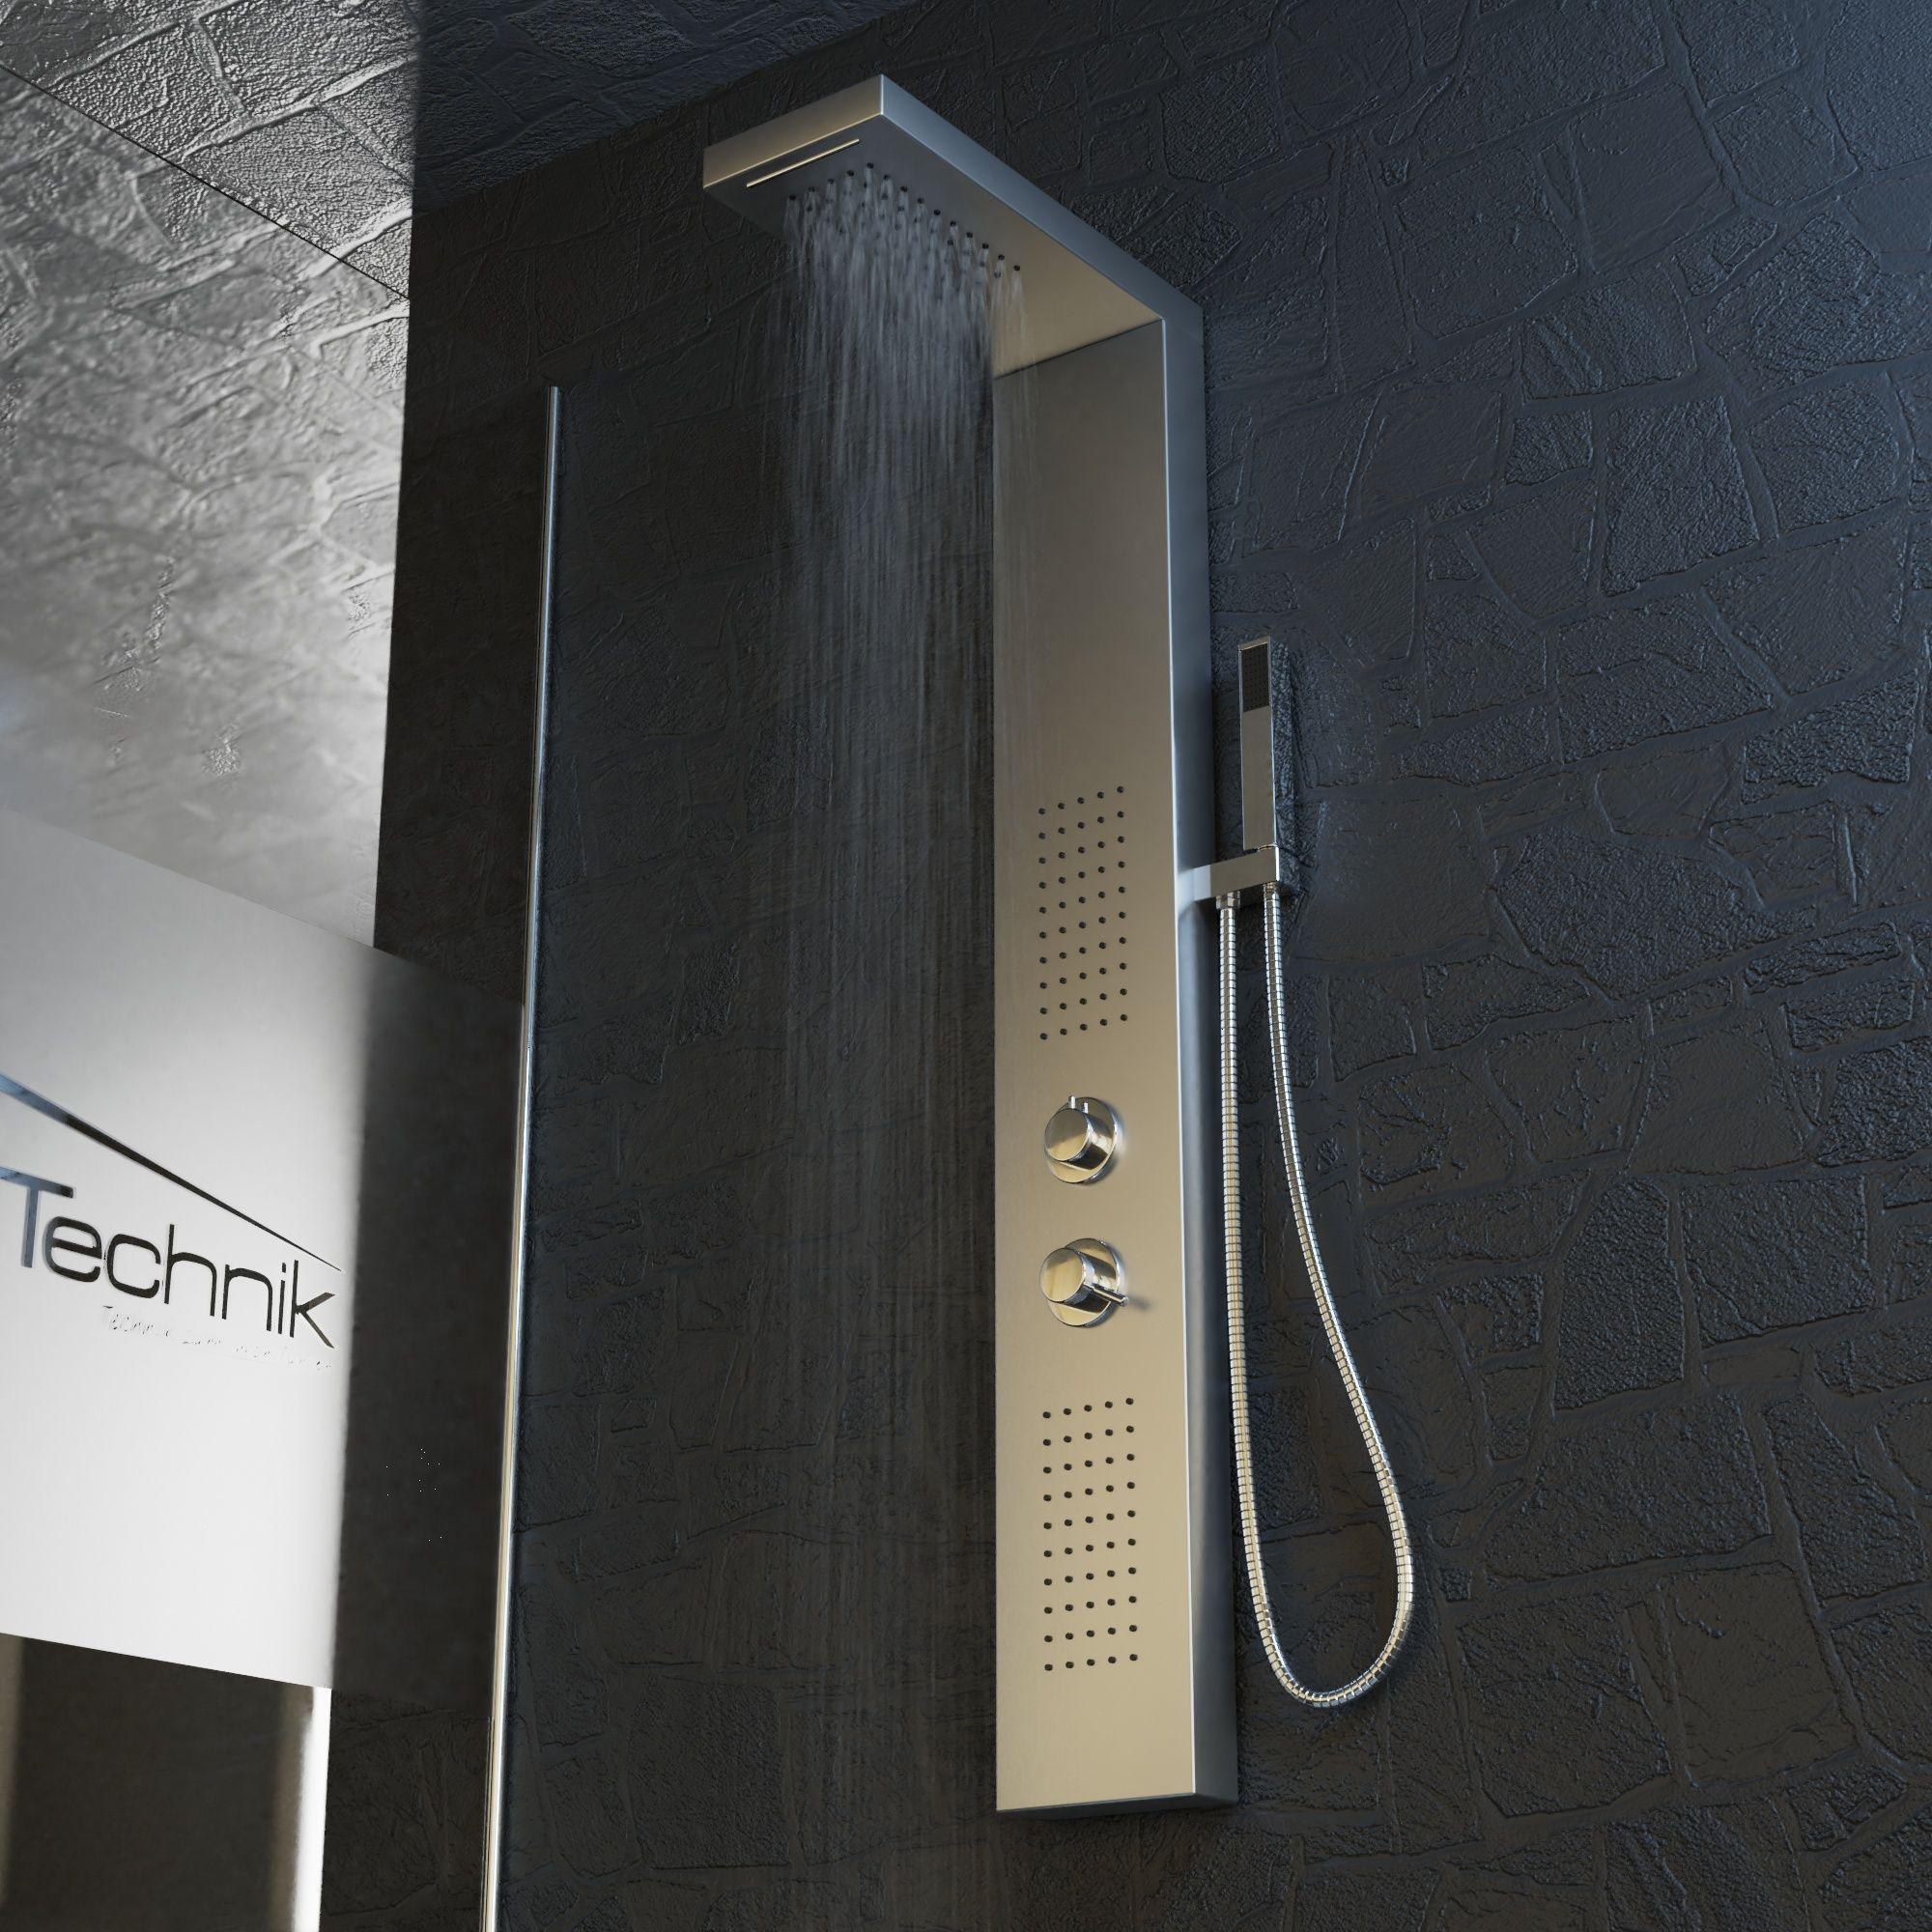 Duschpaneel Poseidon Edelstahl In 2020 Dusche Waschbecken Schwarz Duscharmatur